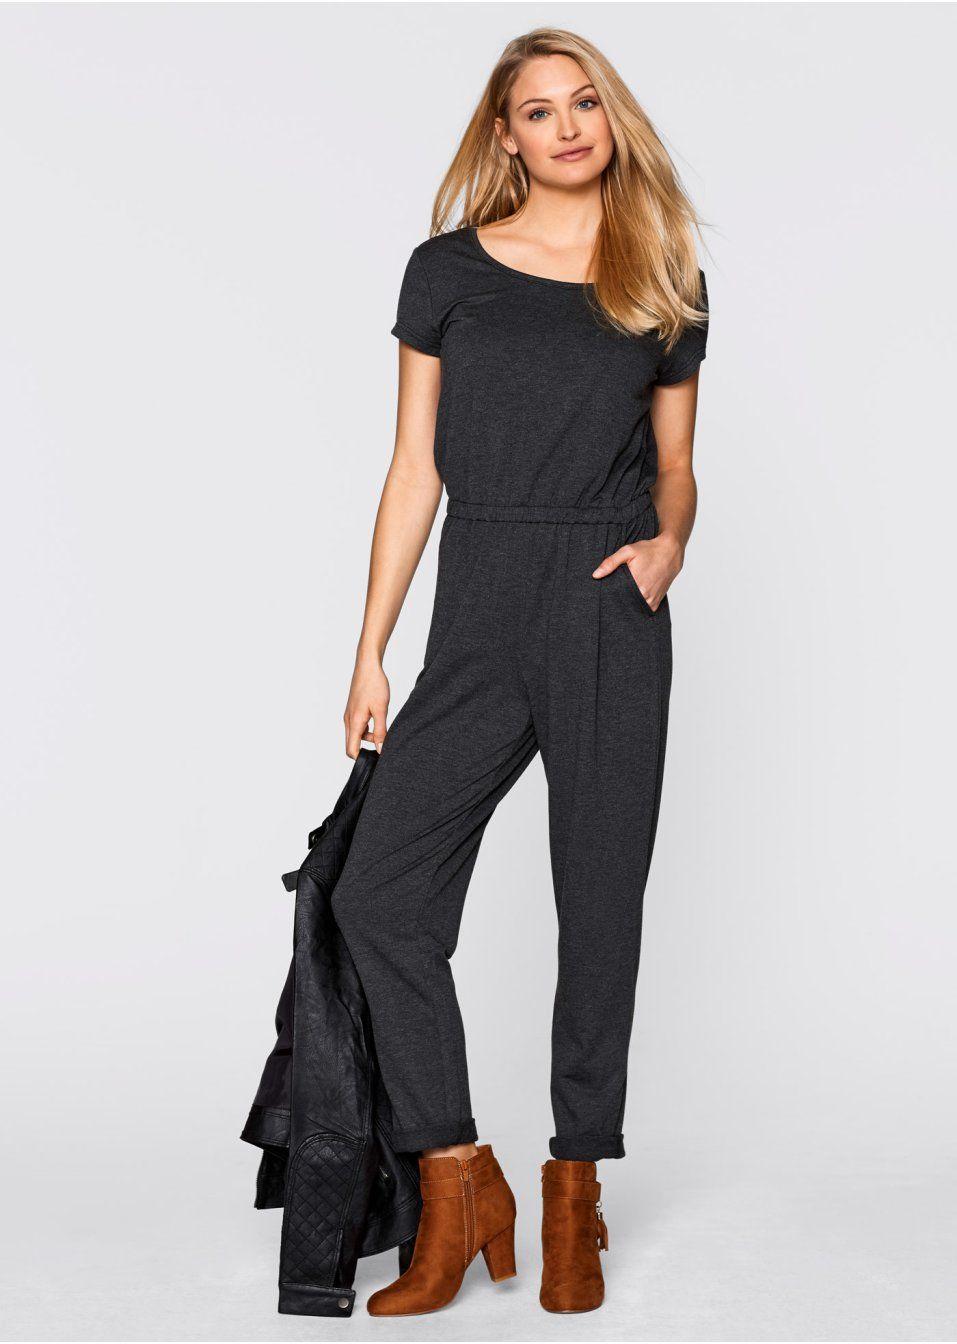 Džersejový jumpsuit S elastickým lemom • 19.99 € • bonprix